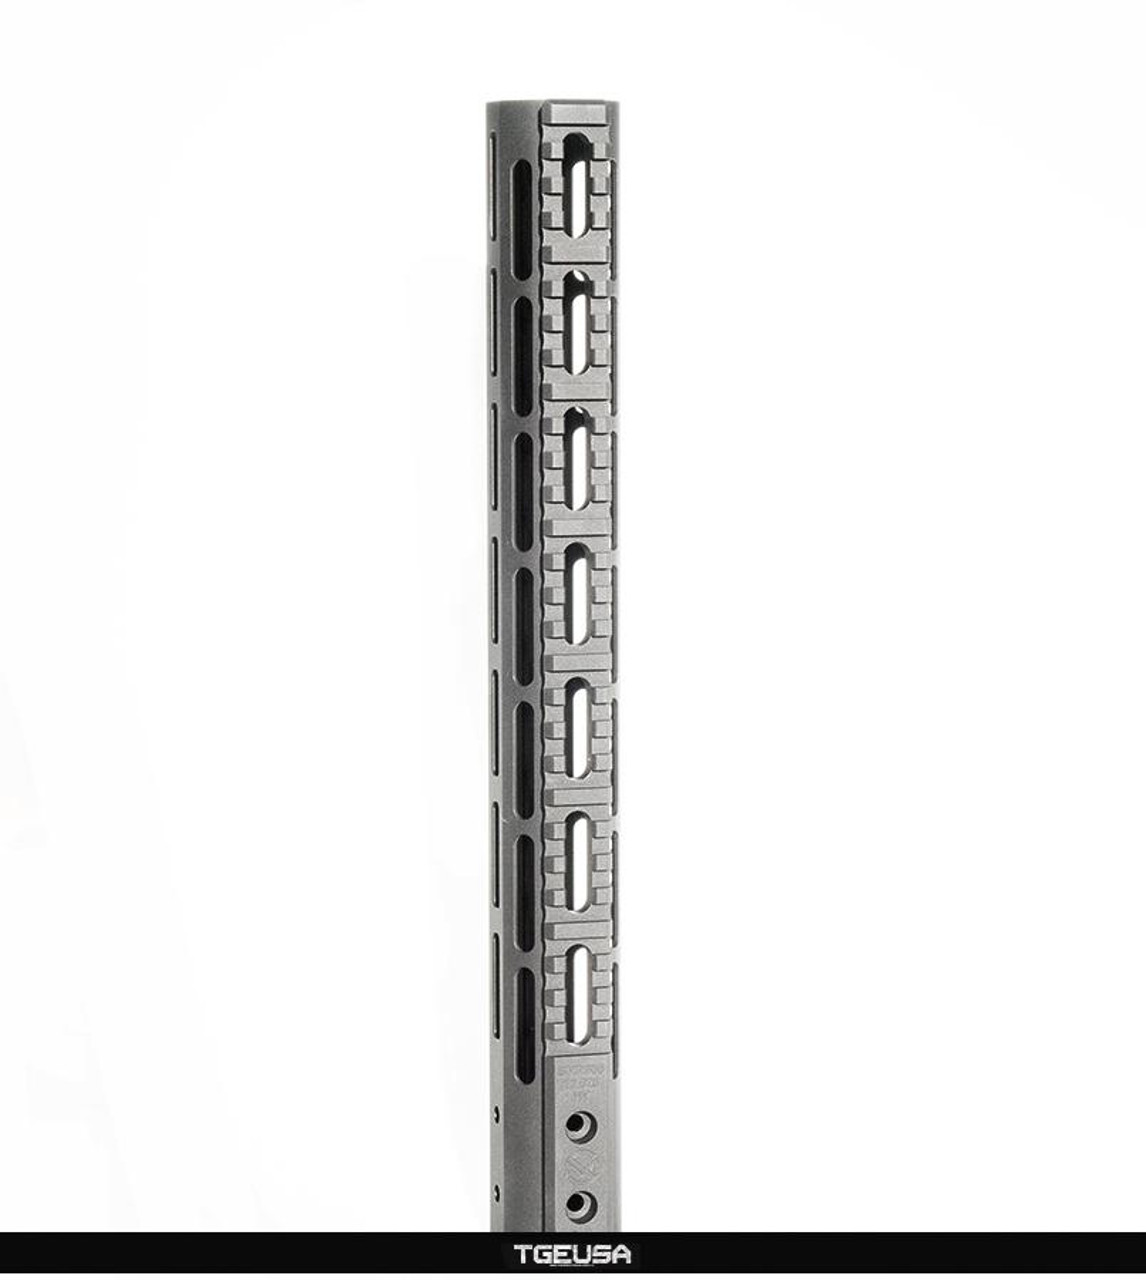 "SMOS Arms GFY Cross Breed Rail - 15.1"" / Black"